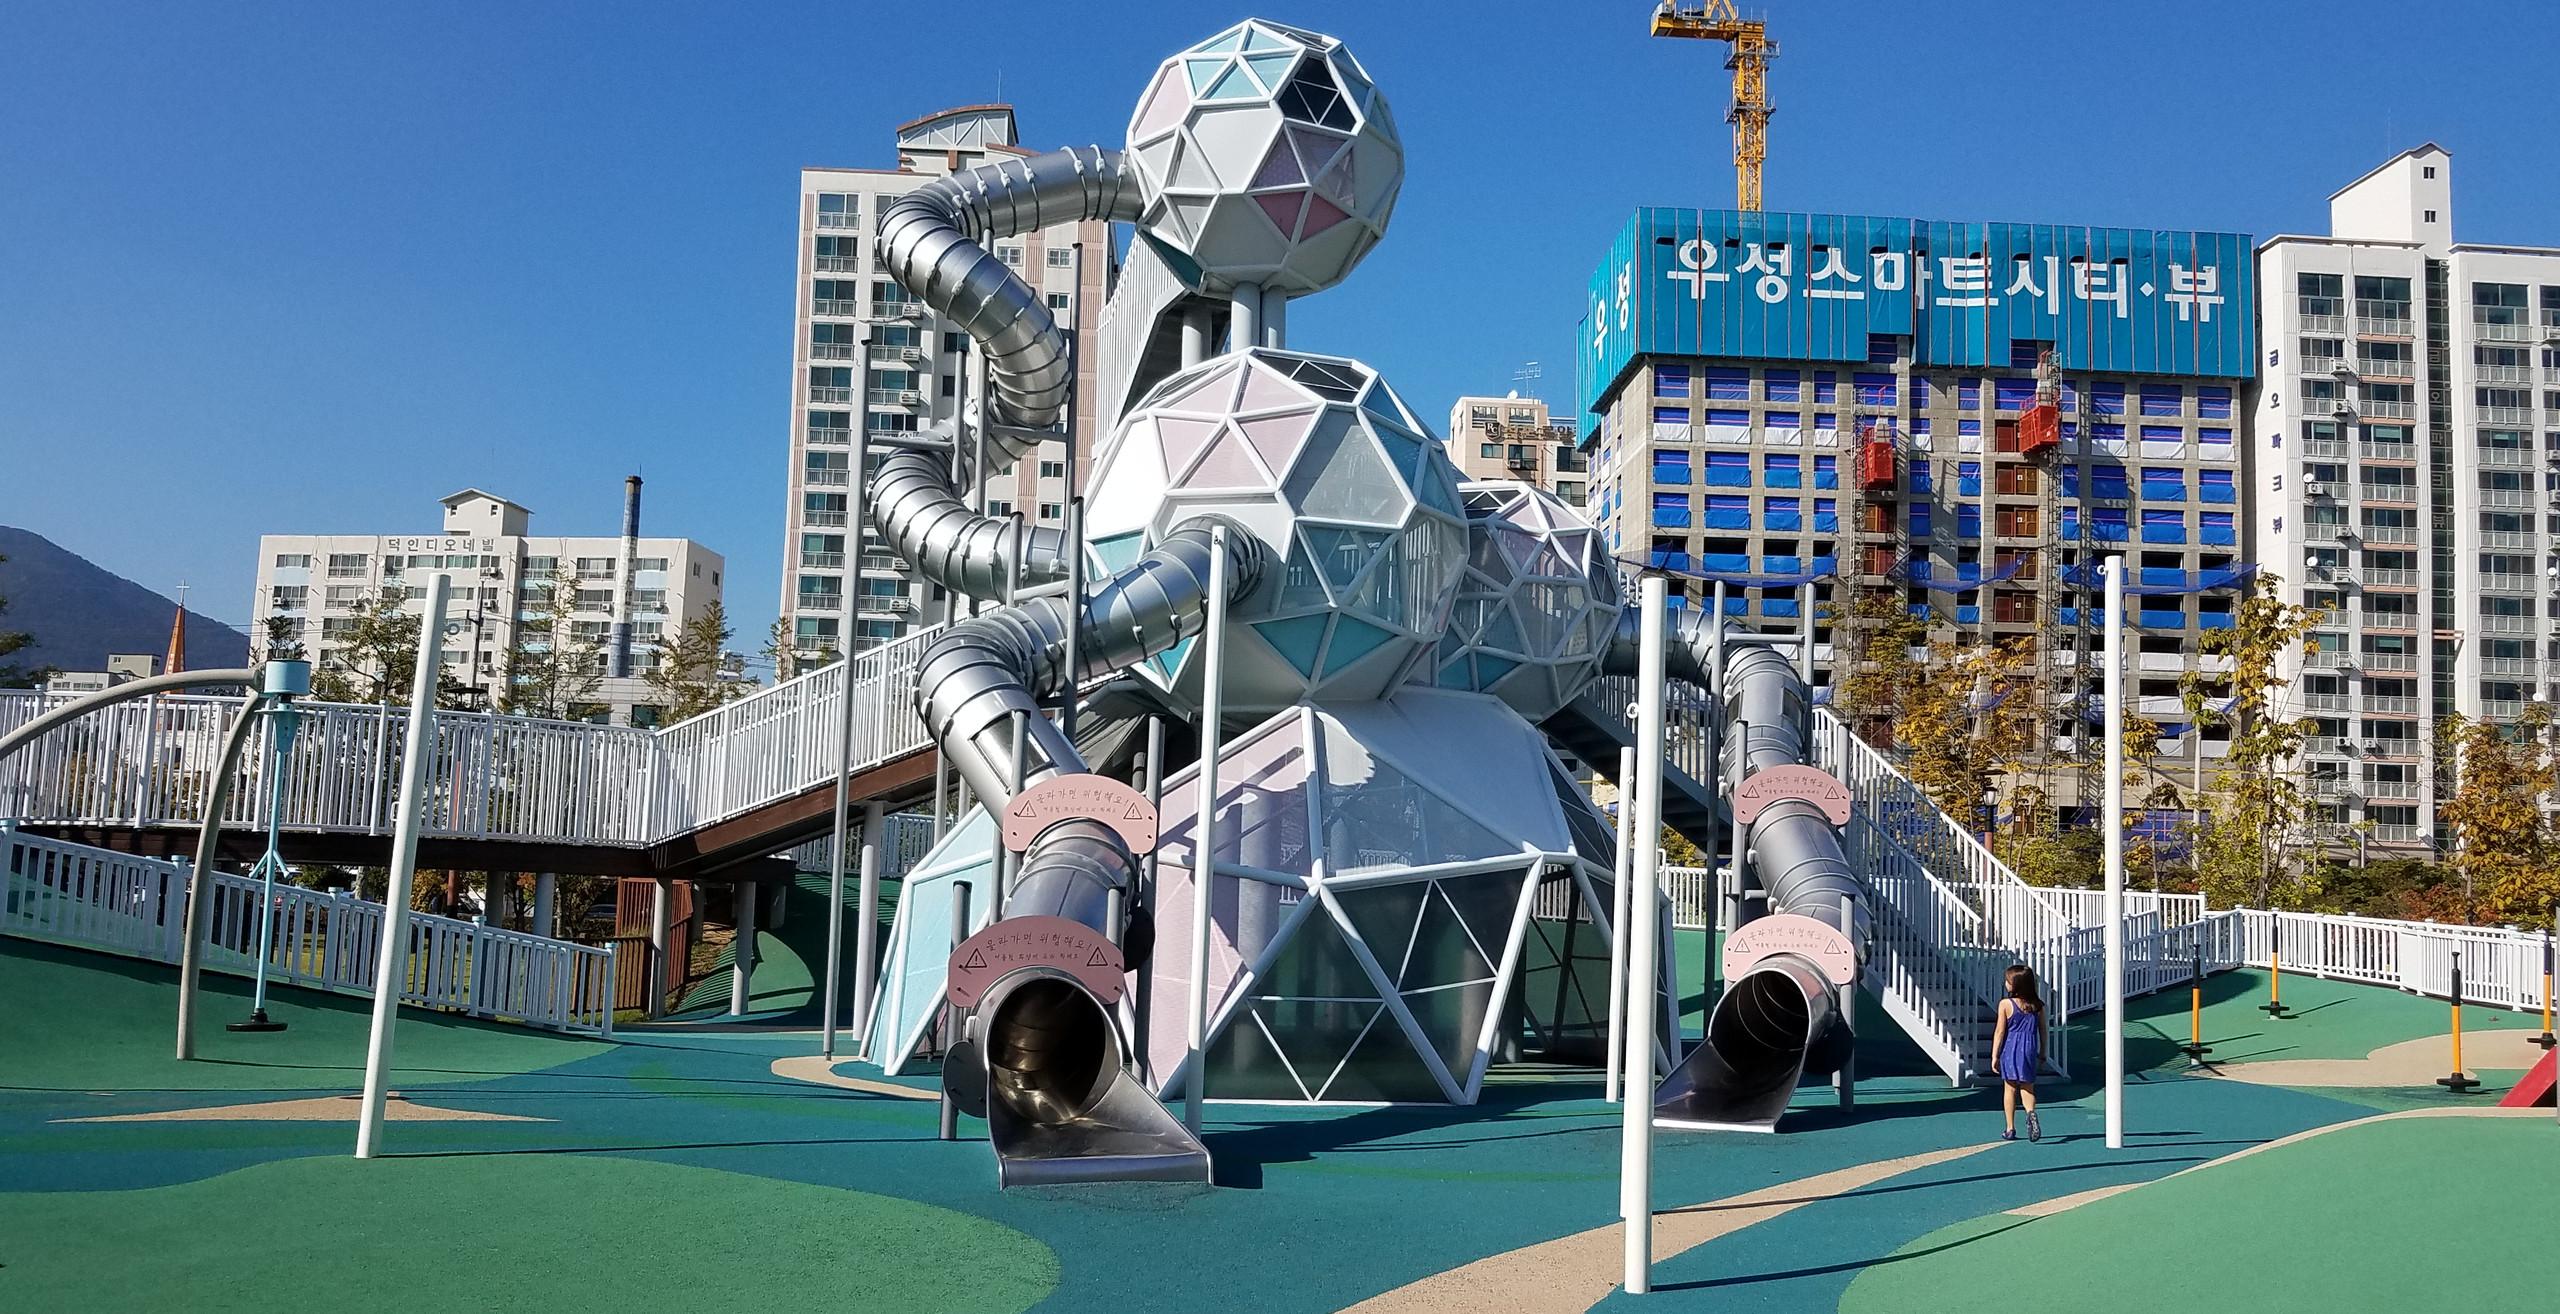 Futuristic playground in Busan